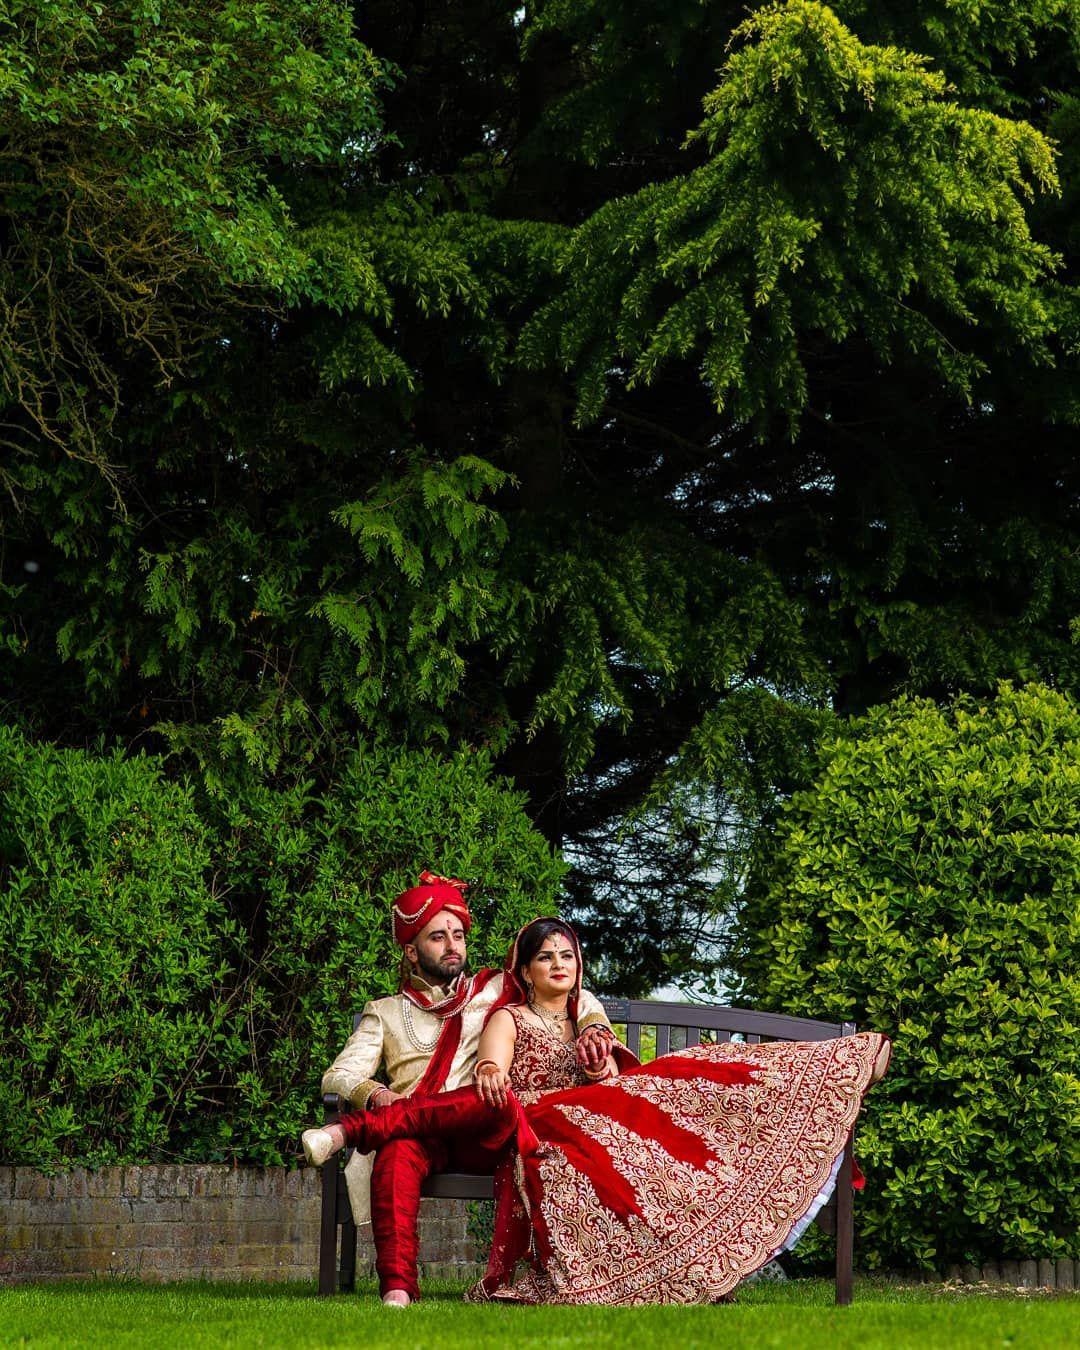 Www Thewedding Hut Co Uk: Getting Married - Jai Shah Photography